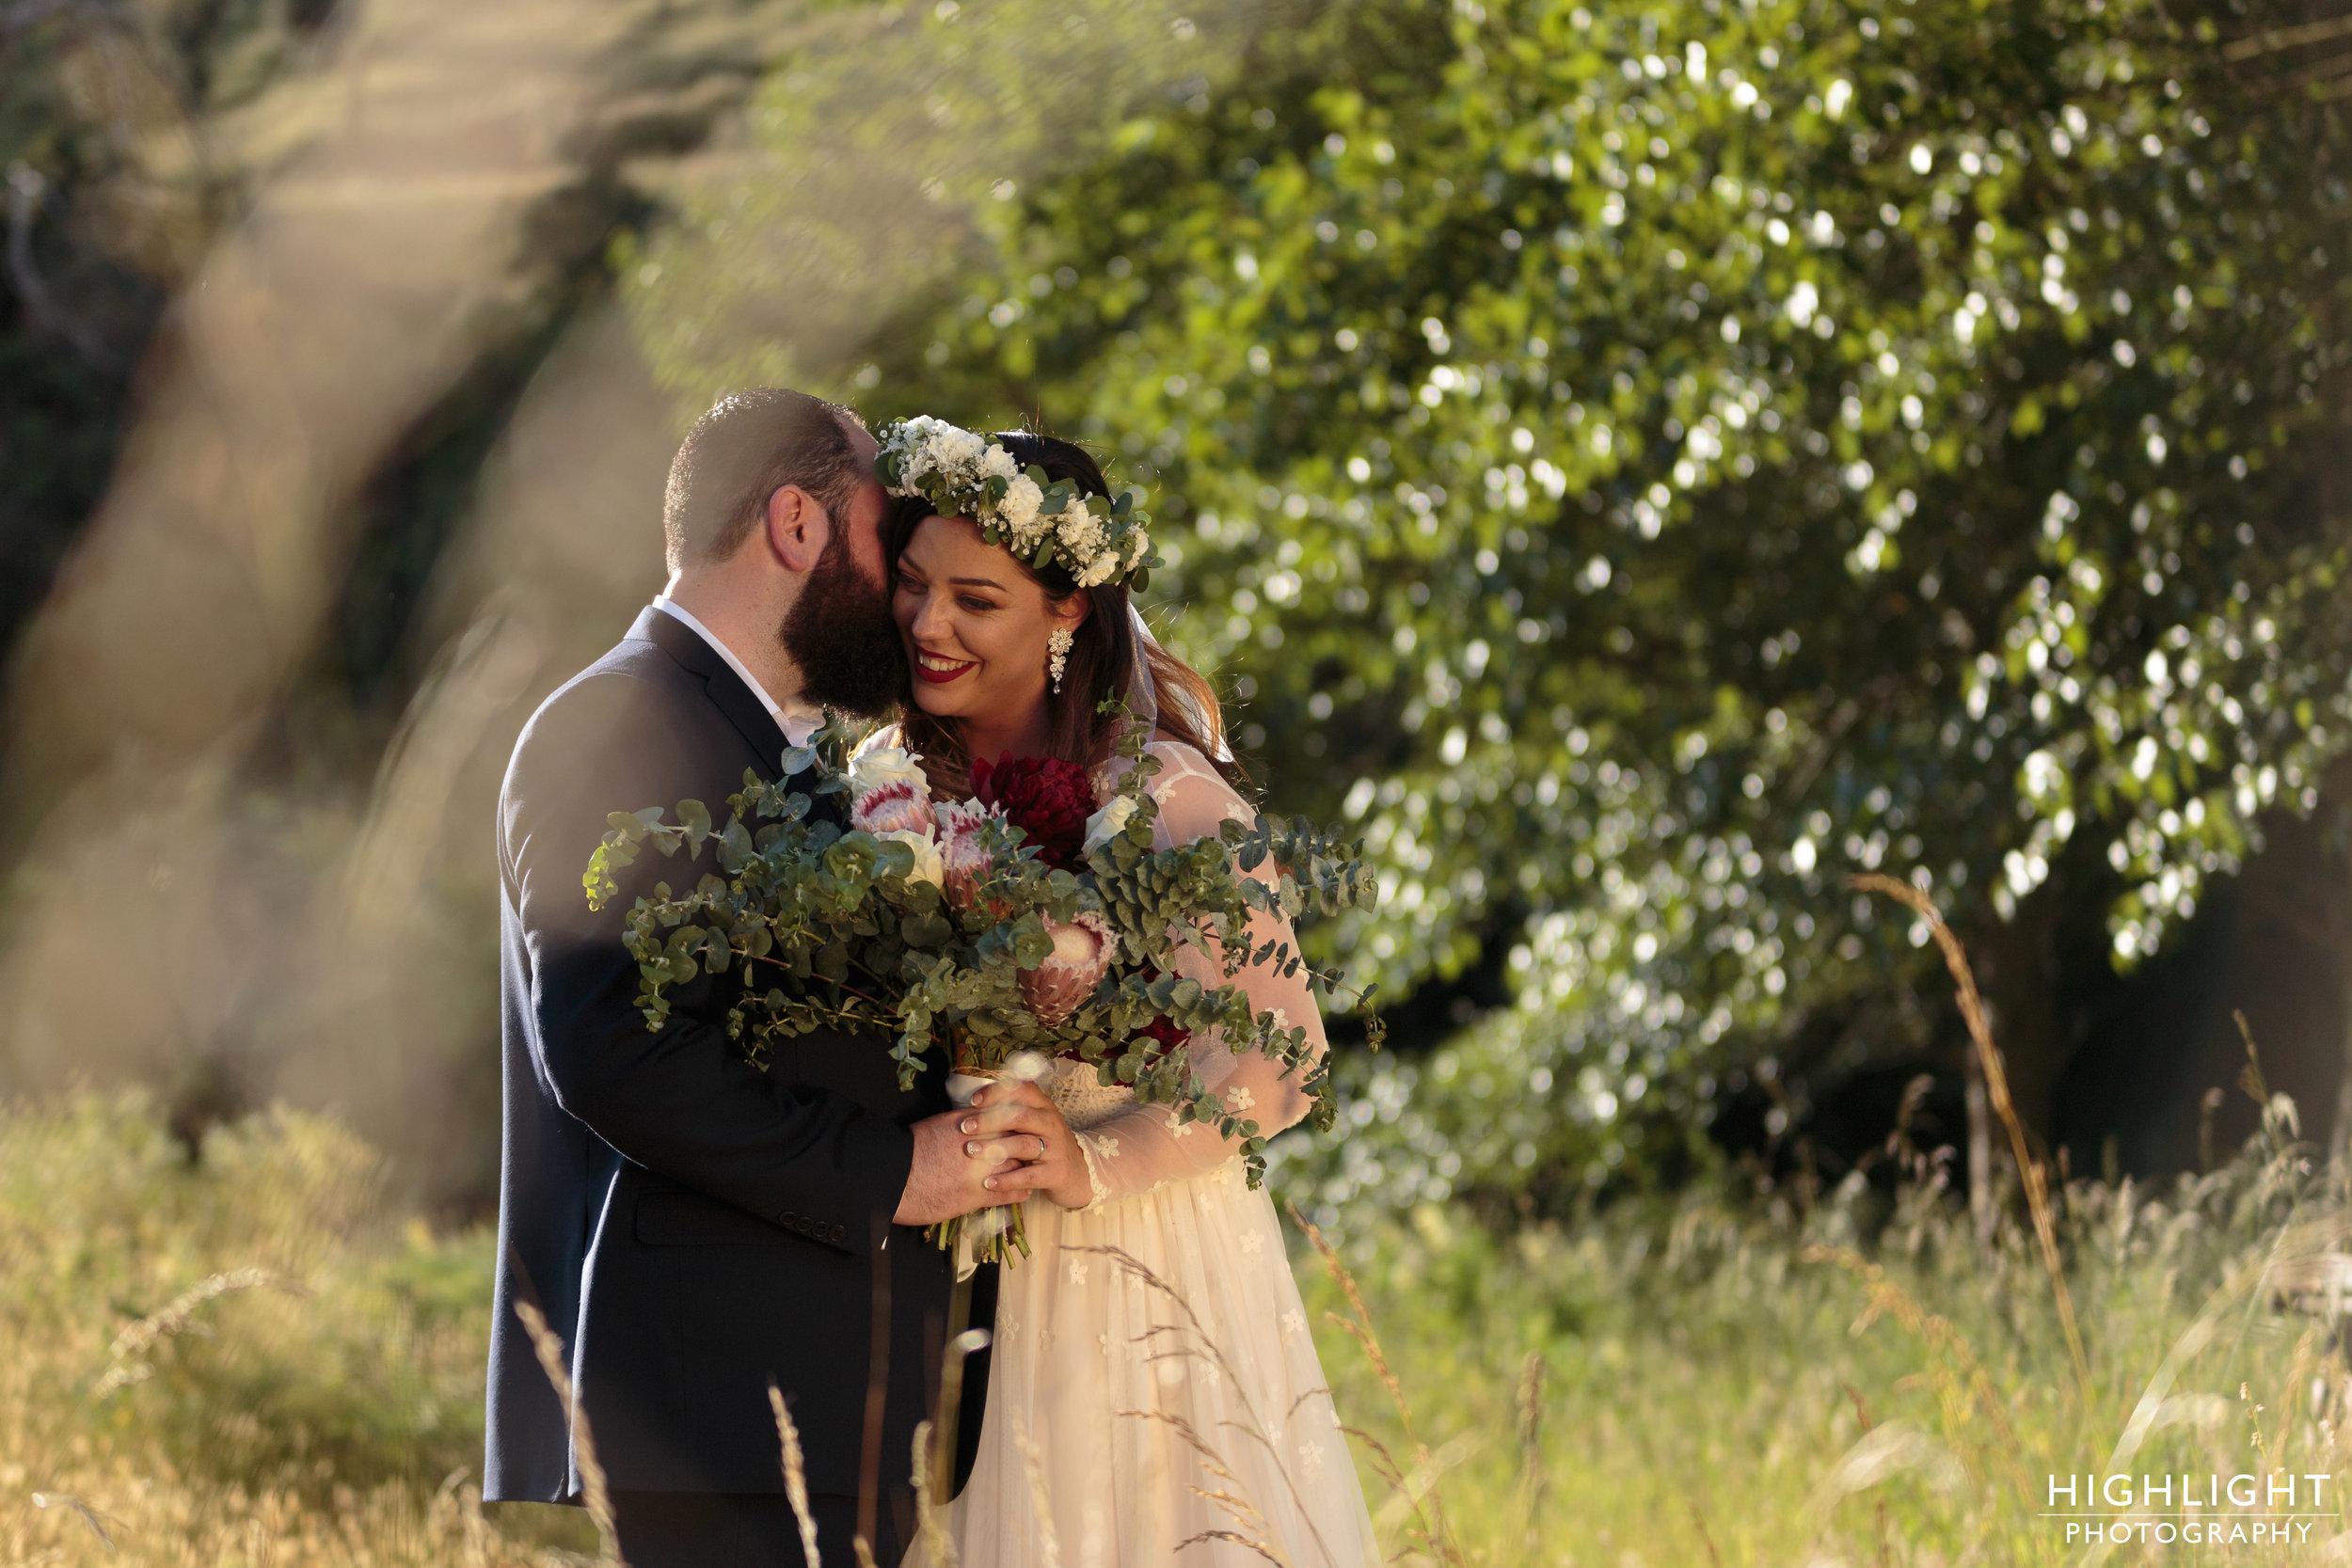 highlight-wedding-photography-new-zealand-makoura-lodge-wedding-143.jpg